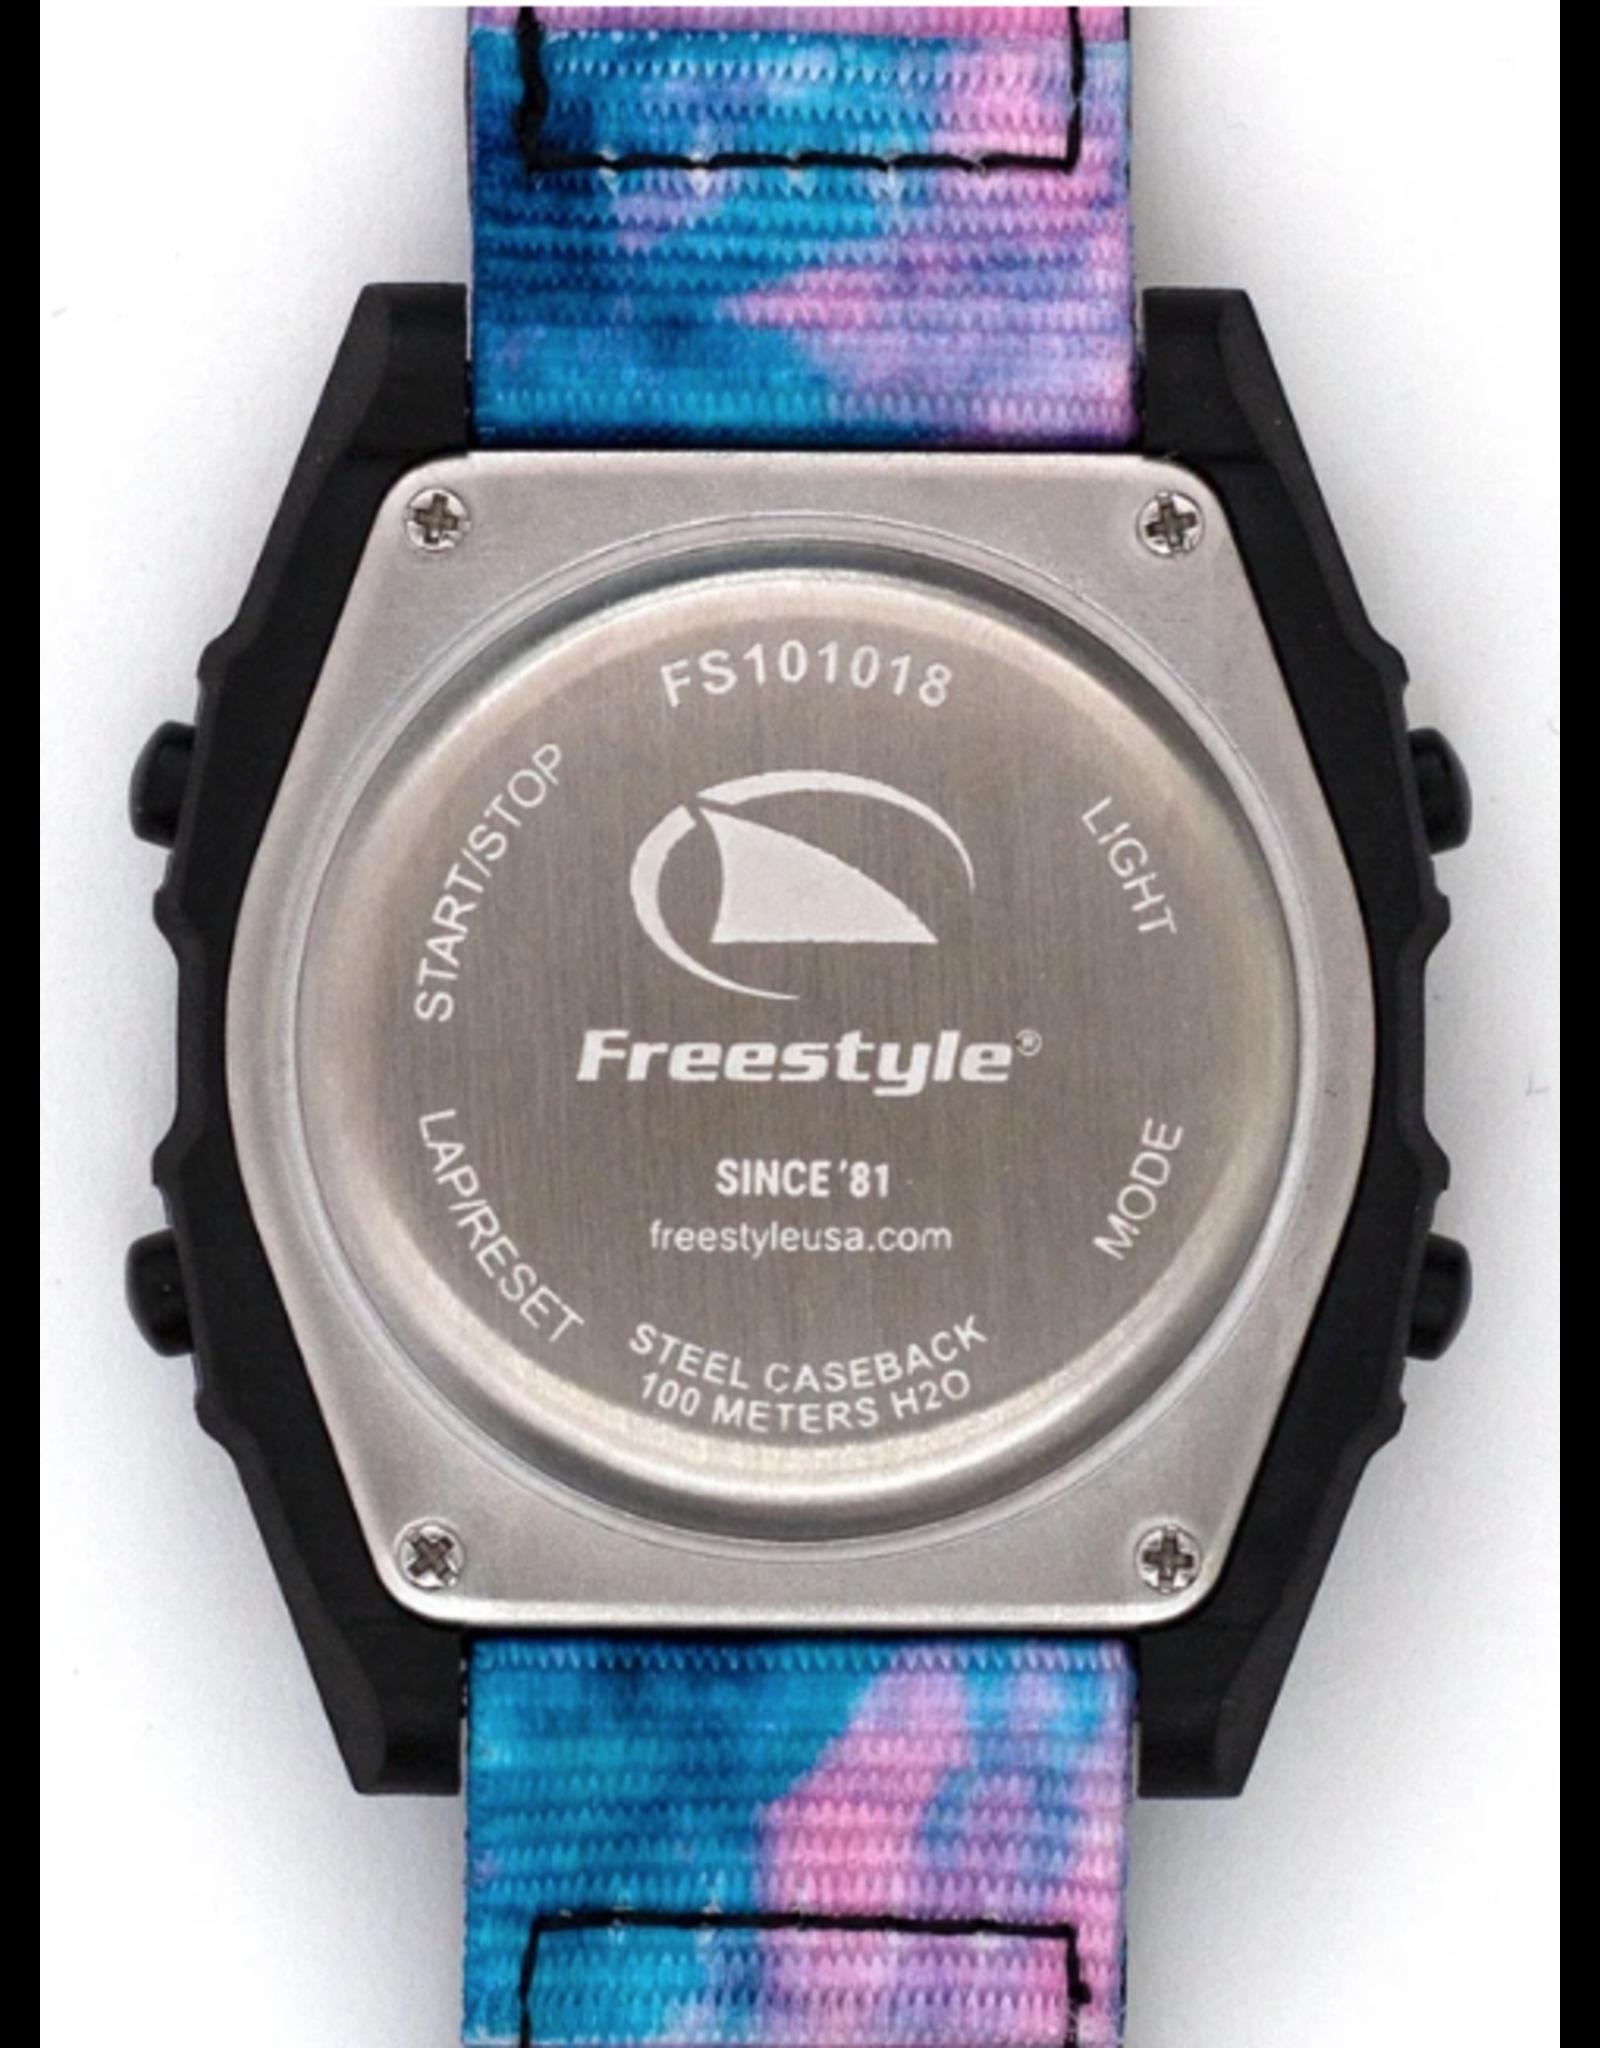 FREESTYLE FREESTYLE SHARK CLASSIC LEASH TIE-DYE BLACK TWIST WATCH